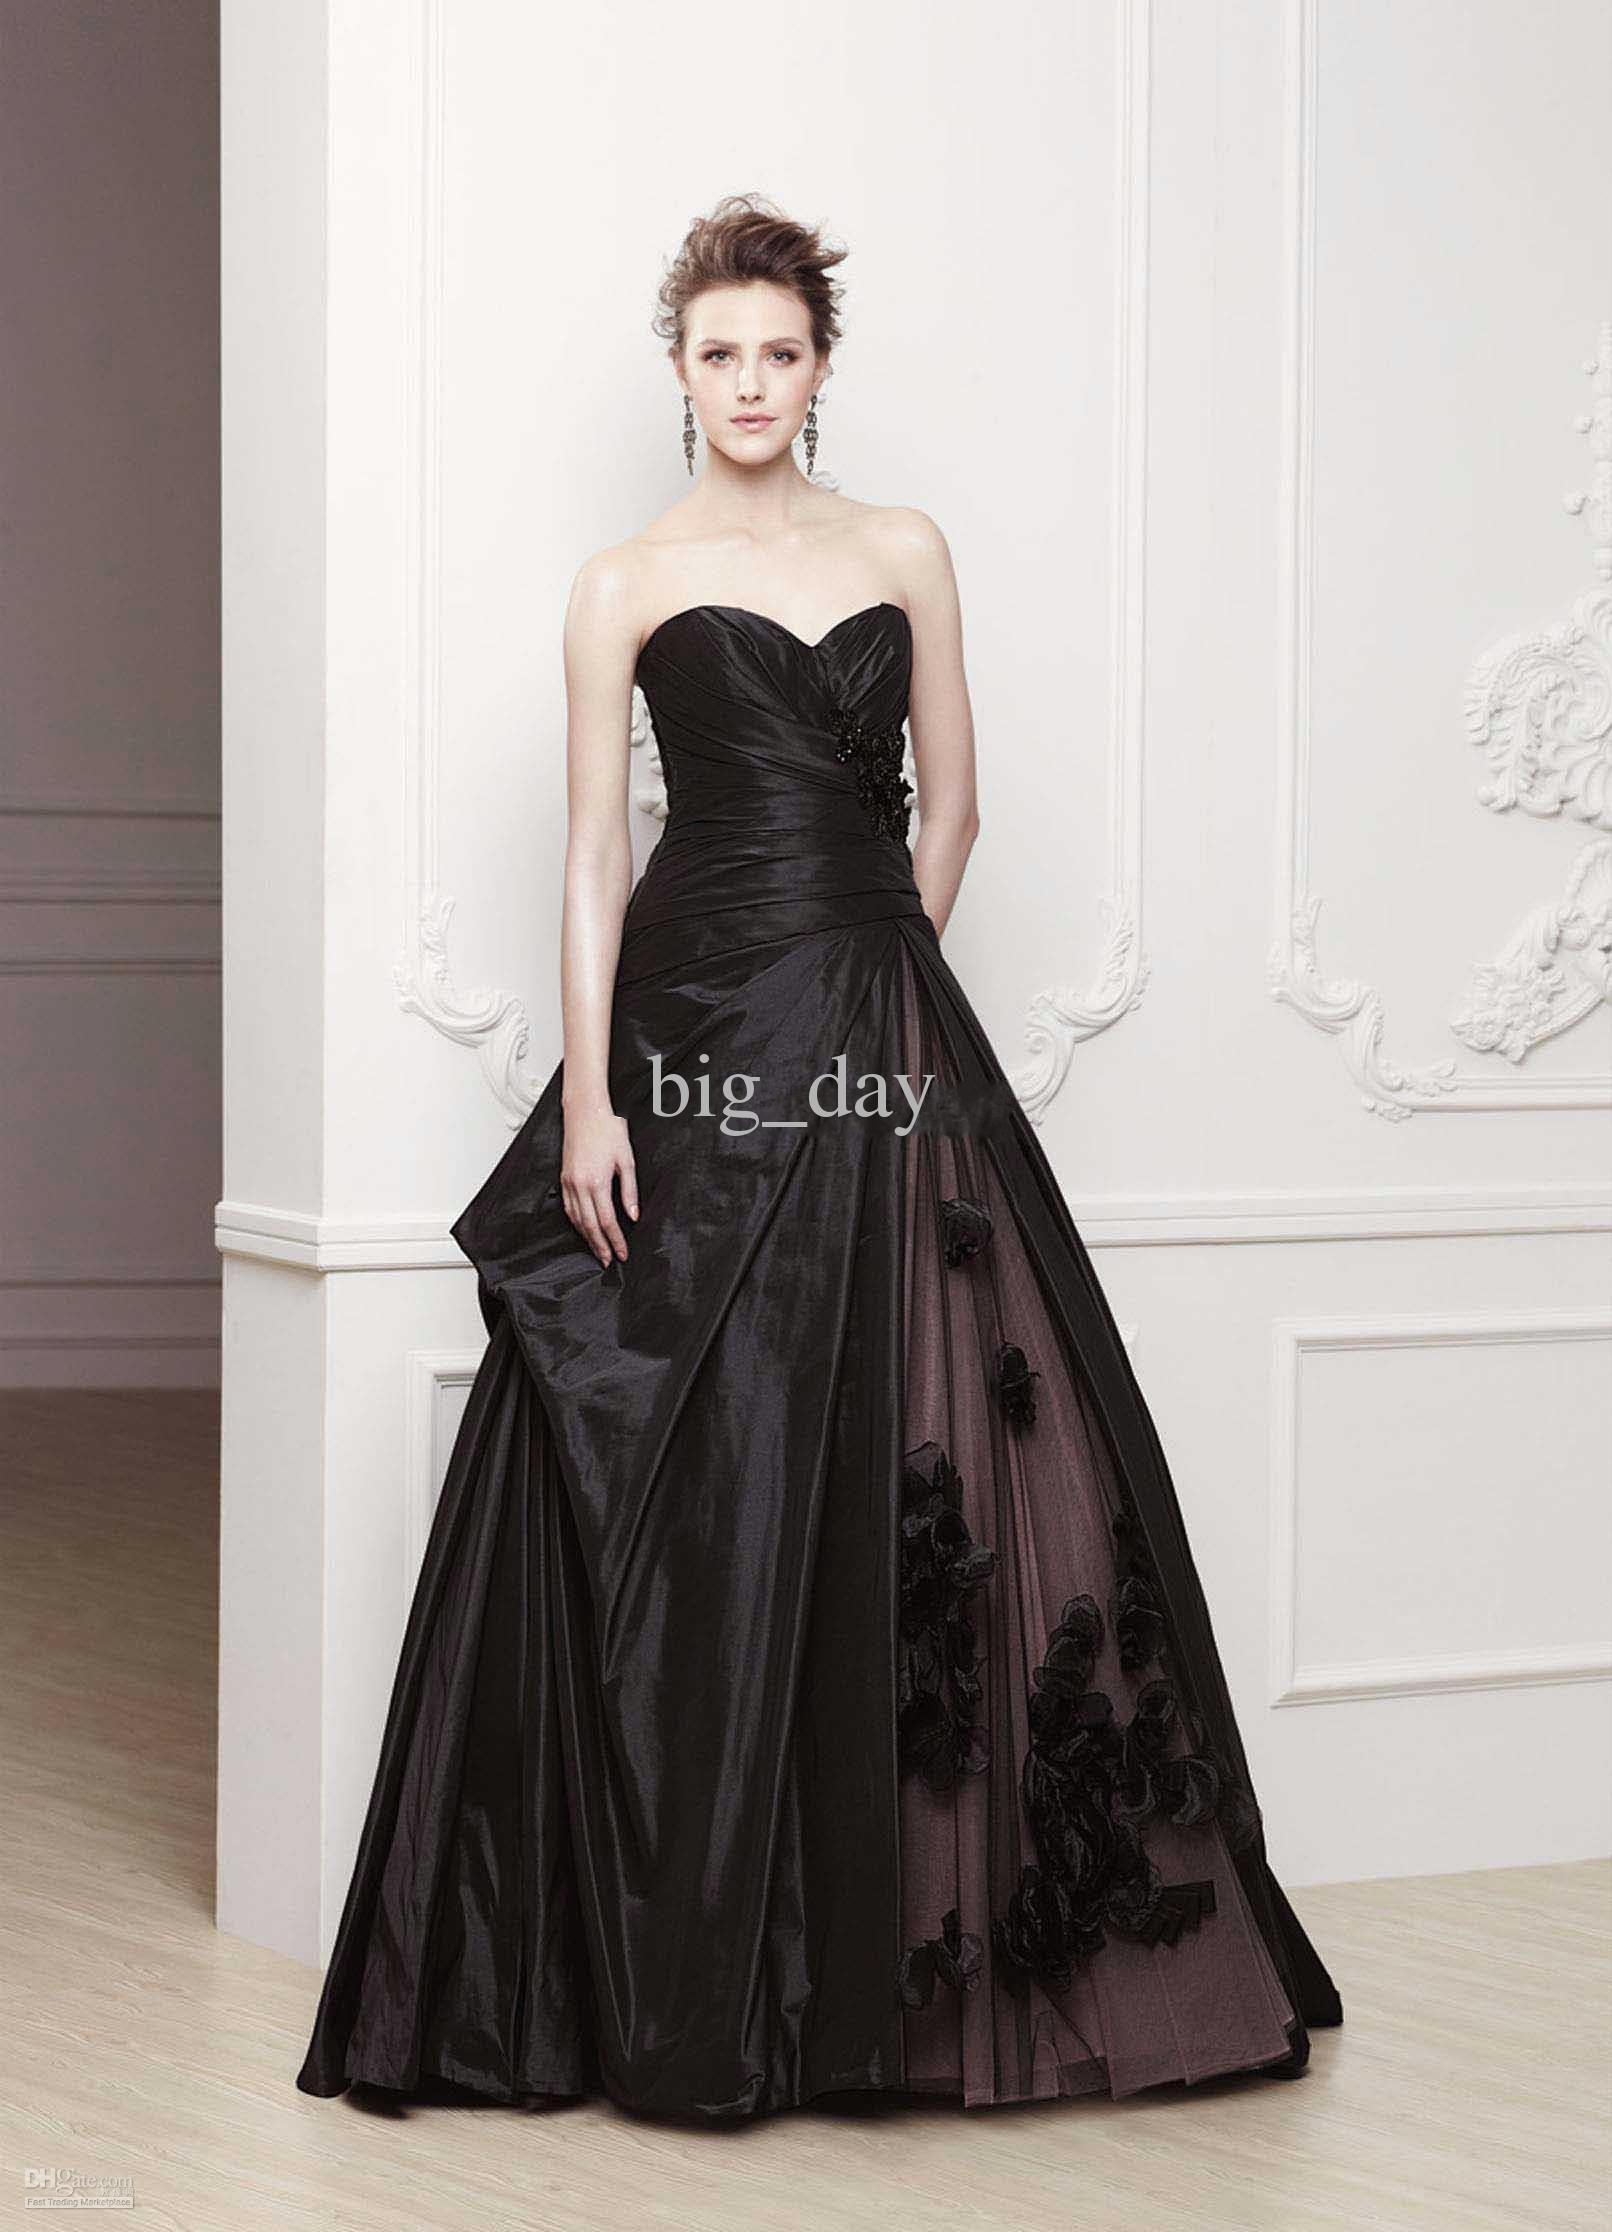 8 Breathtaking Black Wedding Dresses For The Unique Bride